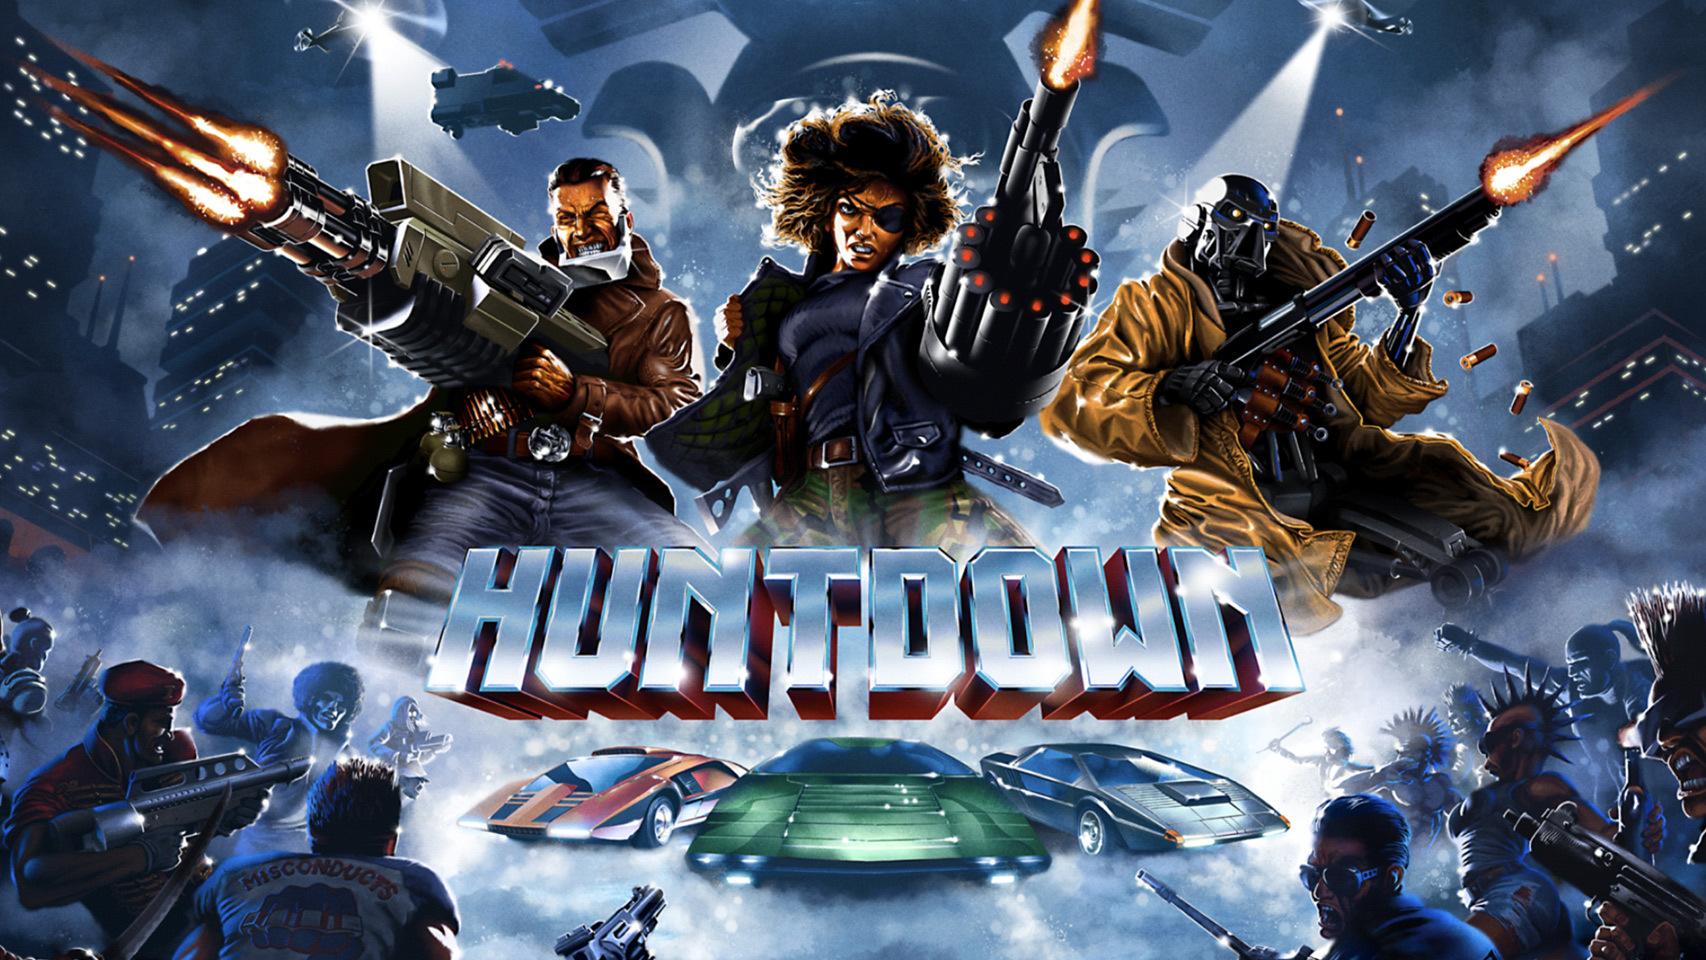 Huntdown,